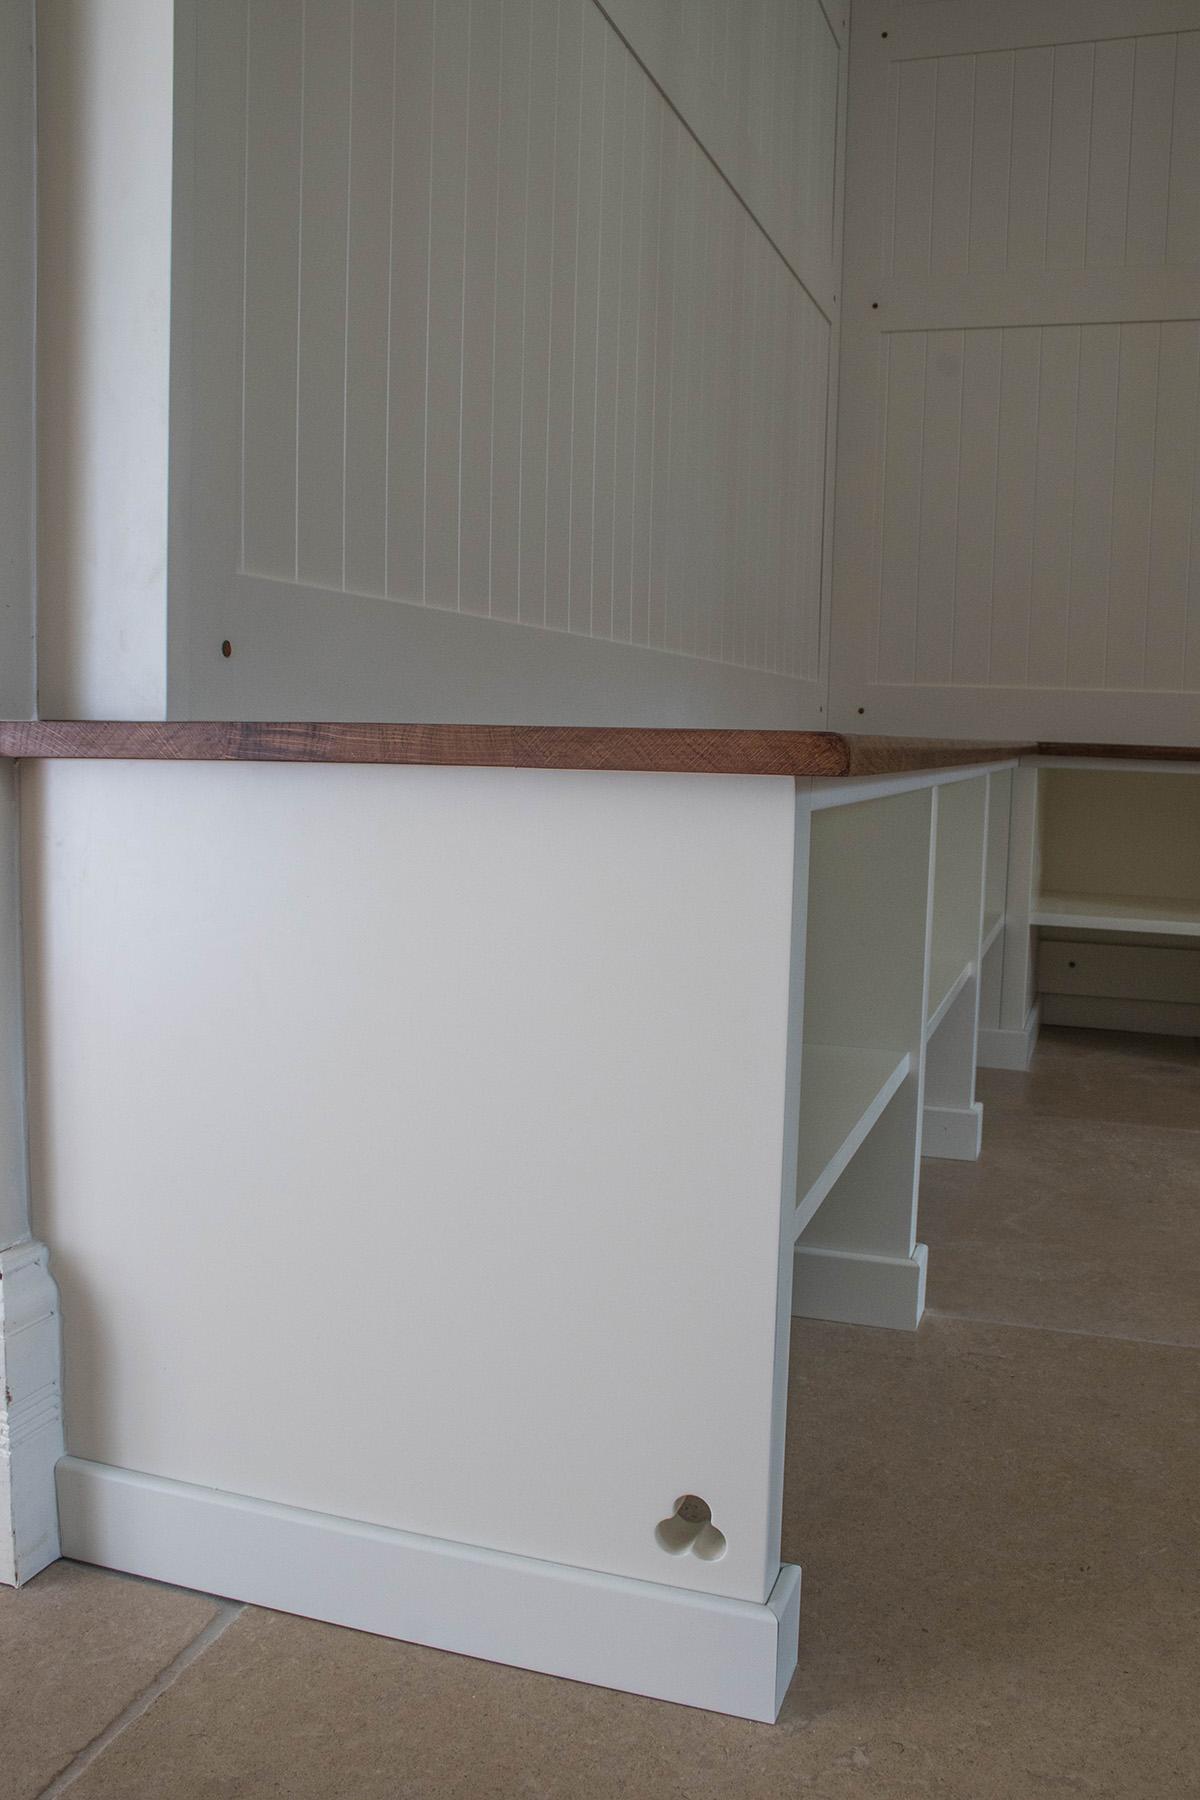 fitted wardrobe bristol, furniture maker bristol, fitted bootroom bristol